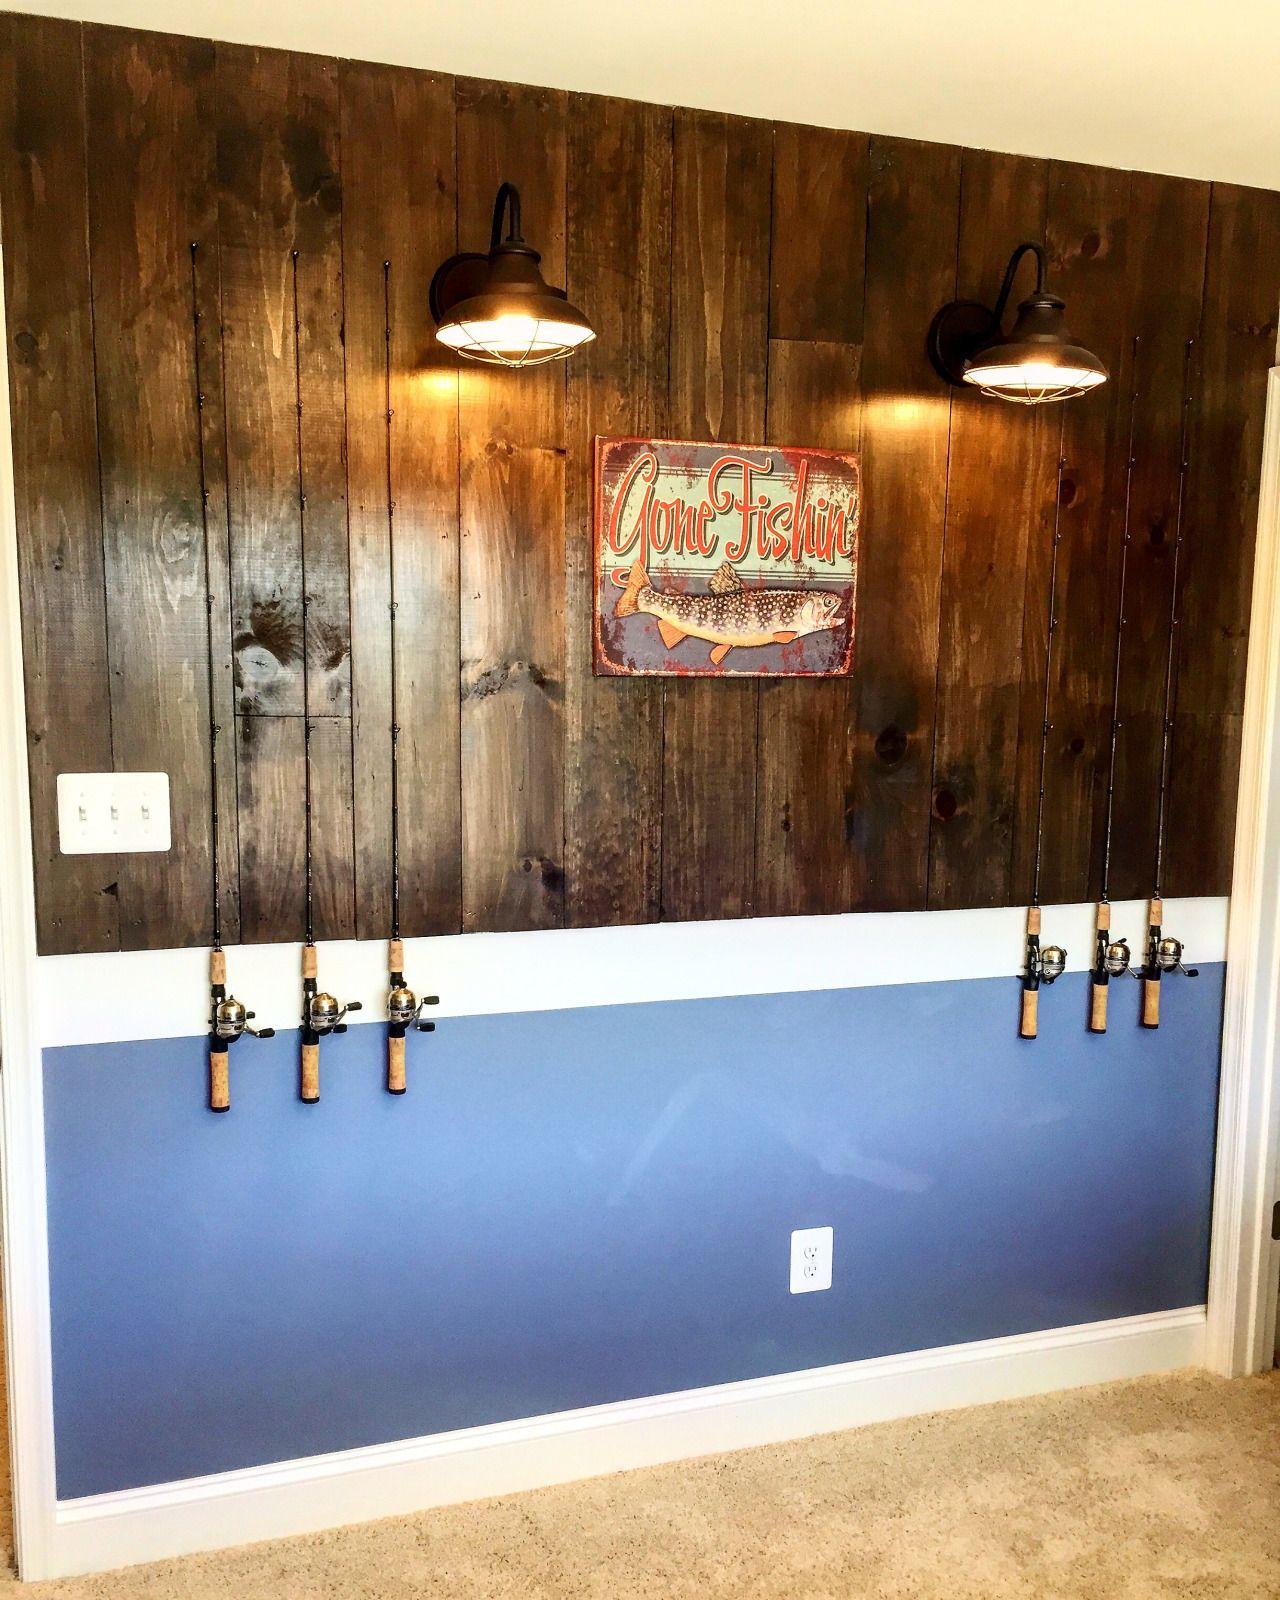 Fish Decor For Home: Fishing Bedroom, Fishing Theme Rooms, Fishing